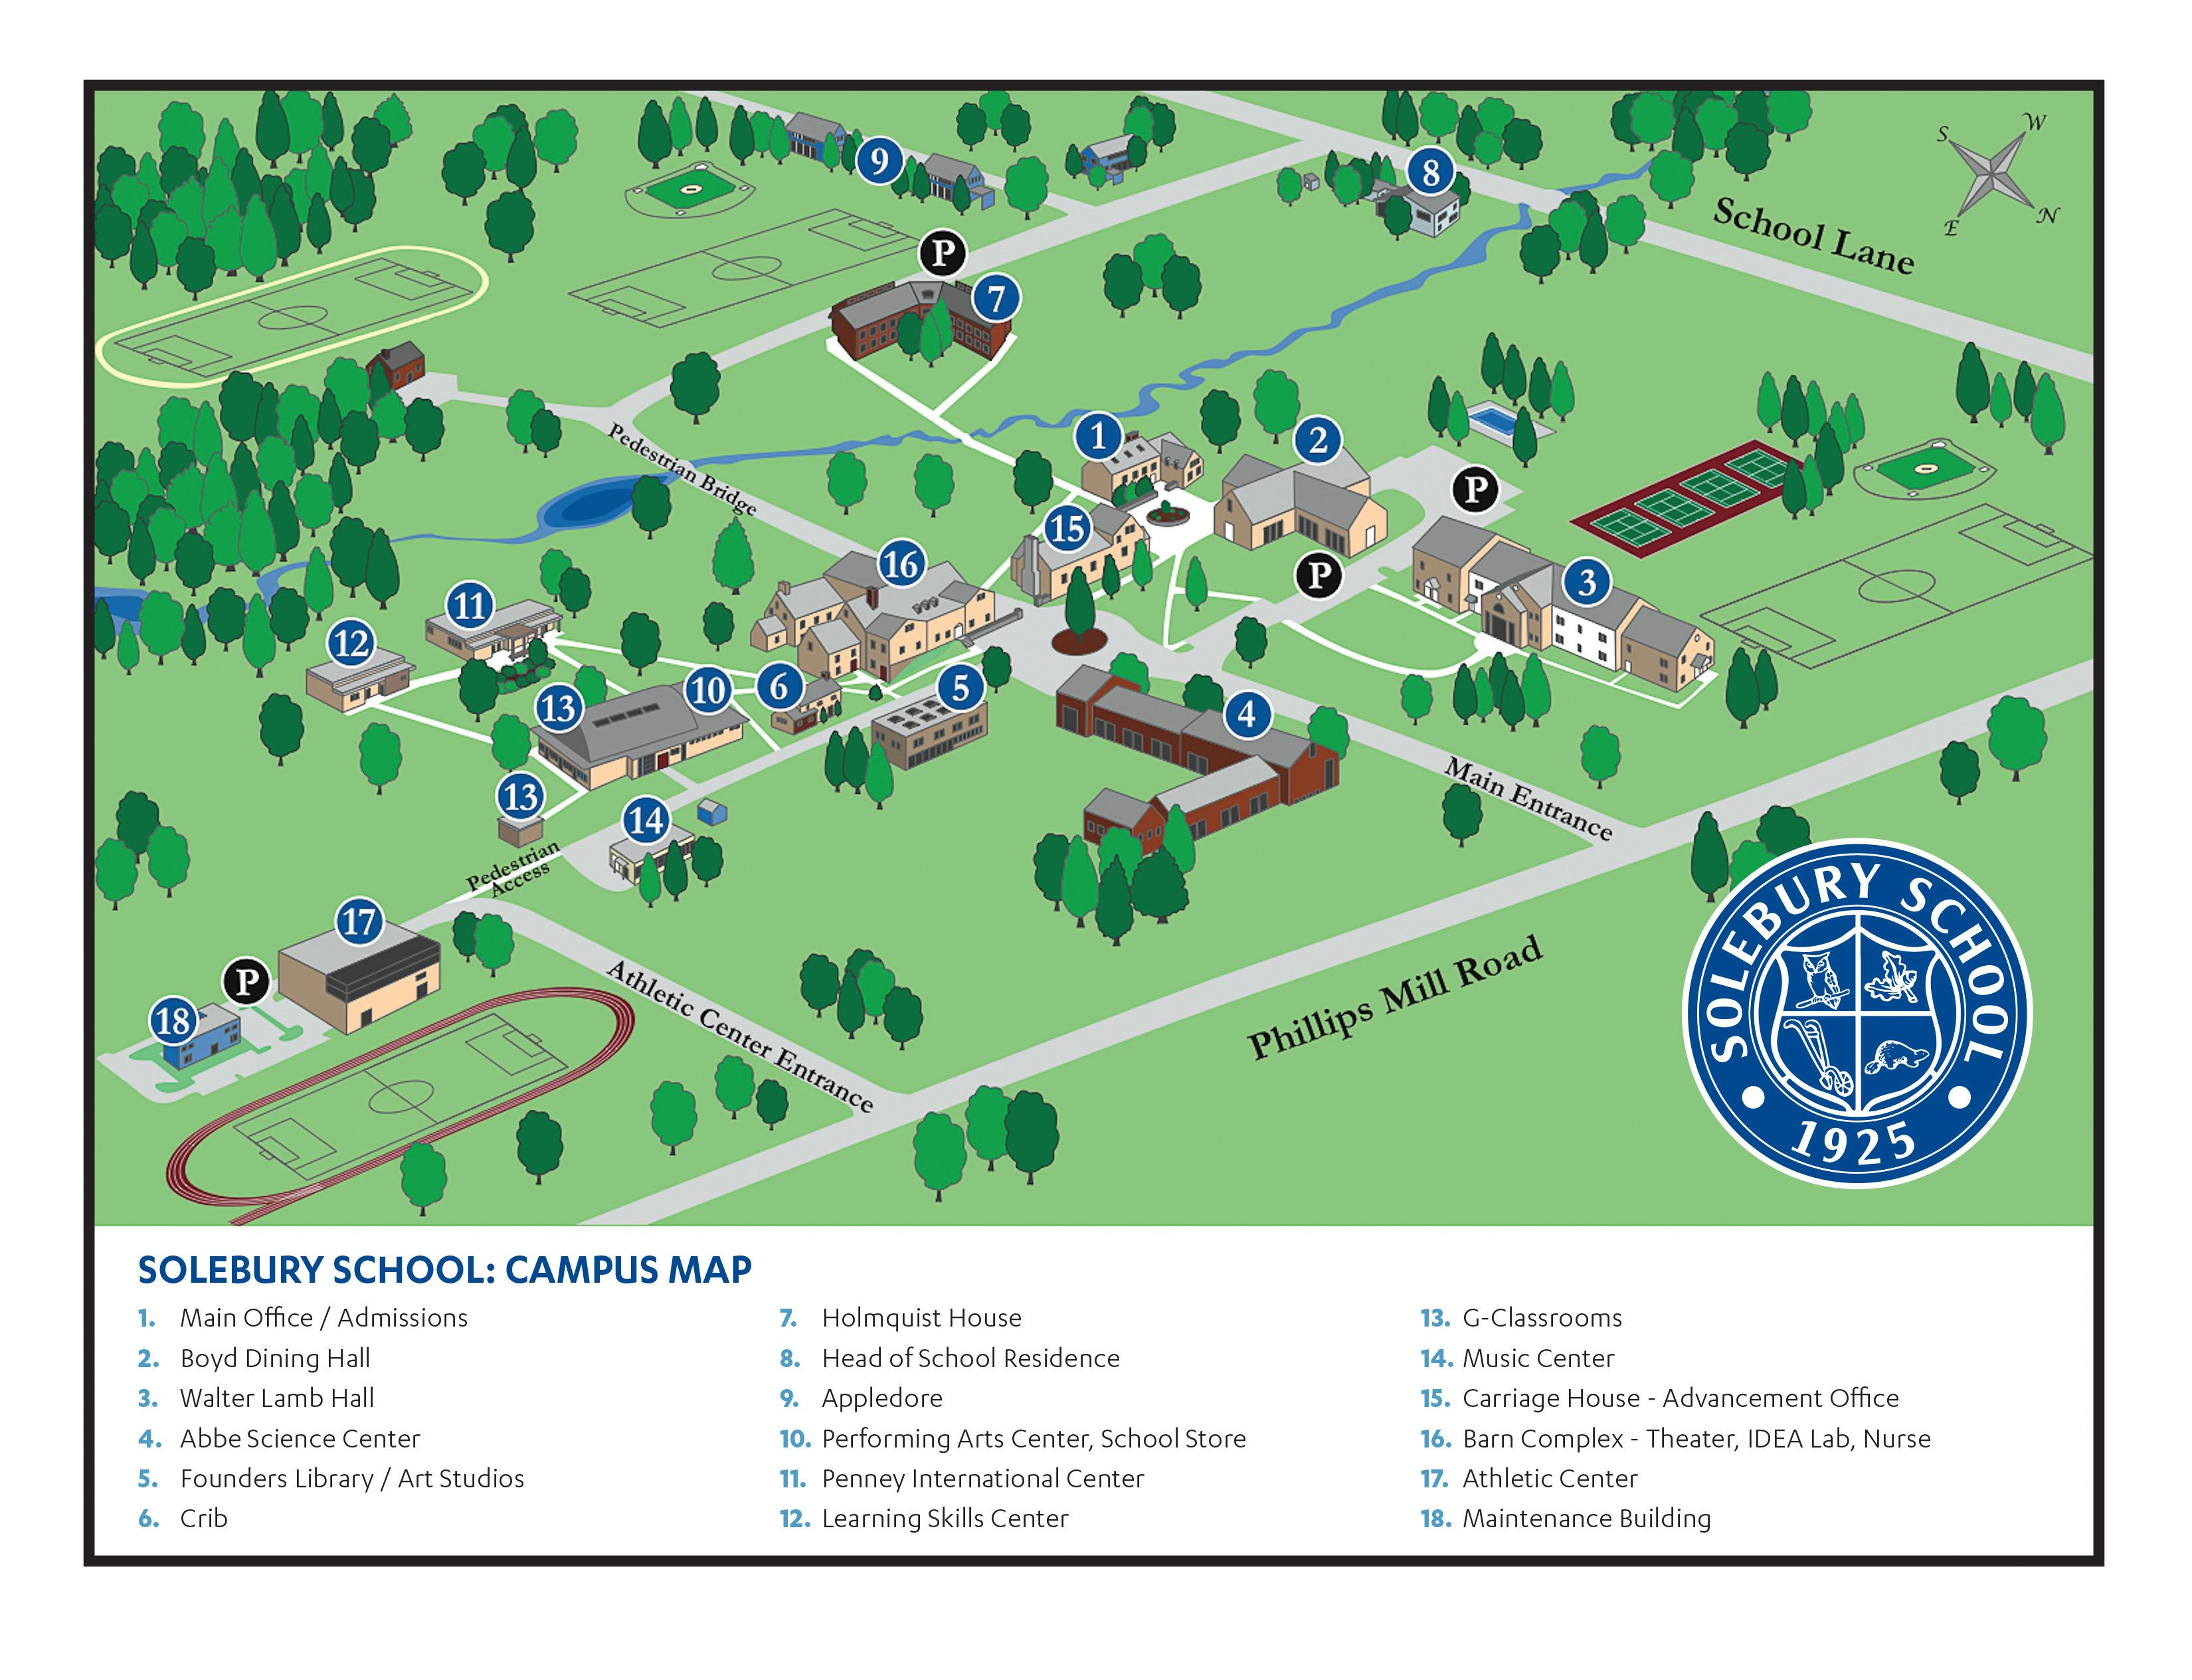 Campus Map - Solebury on